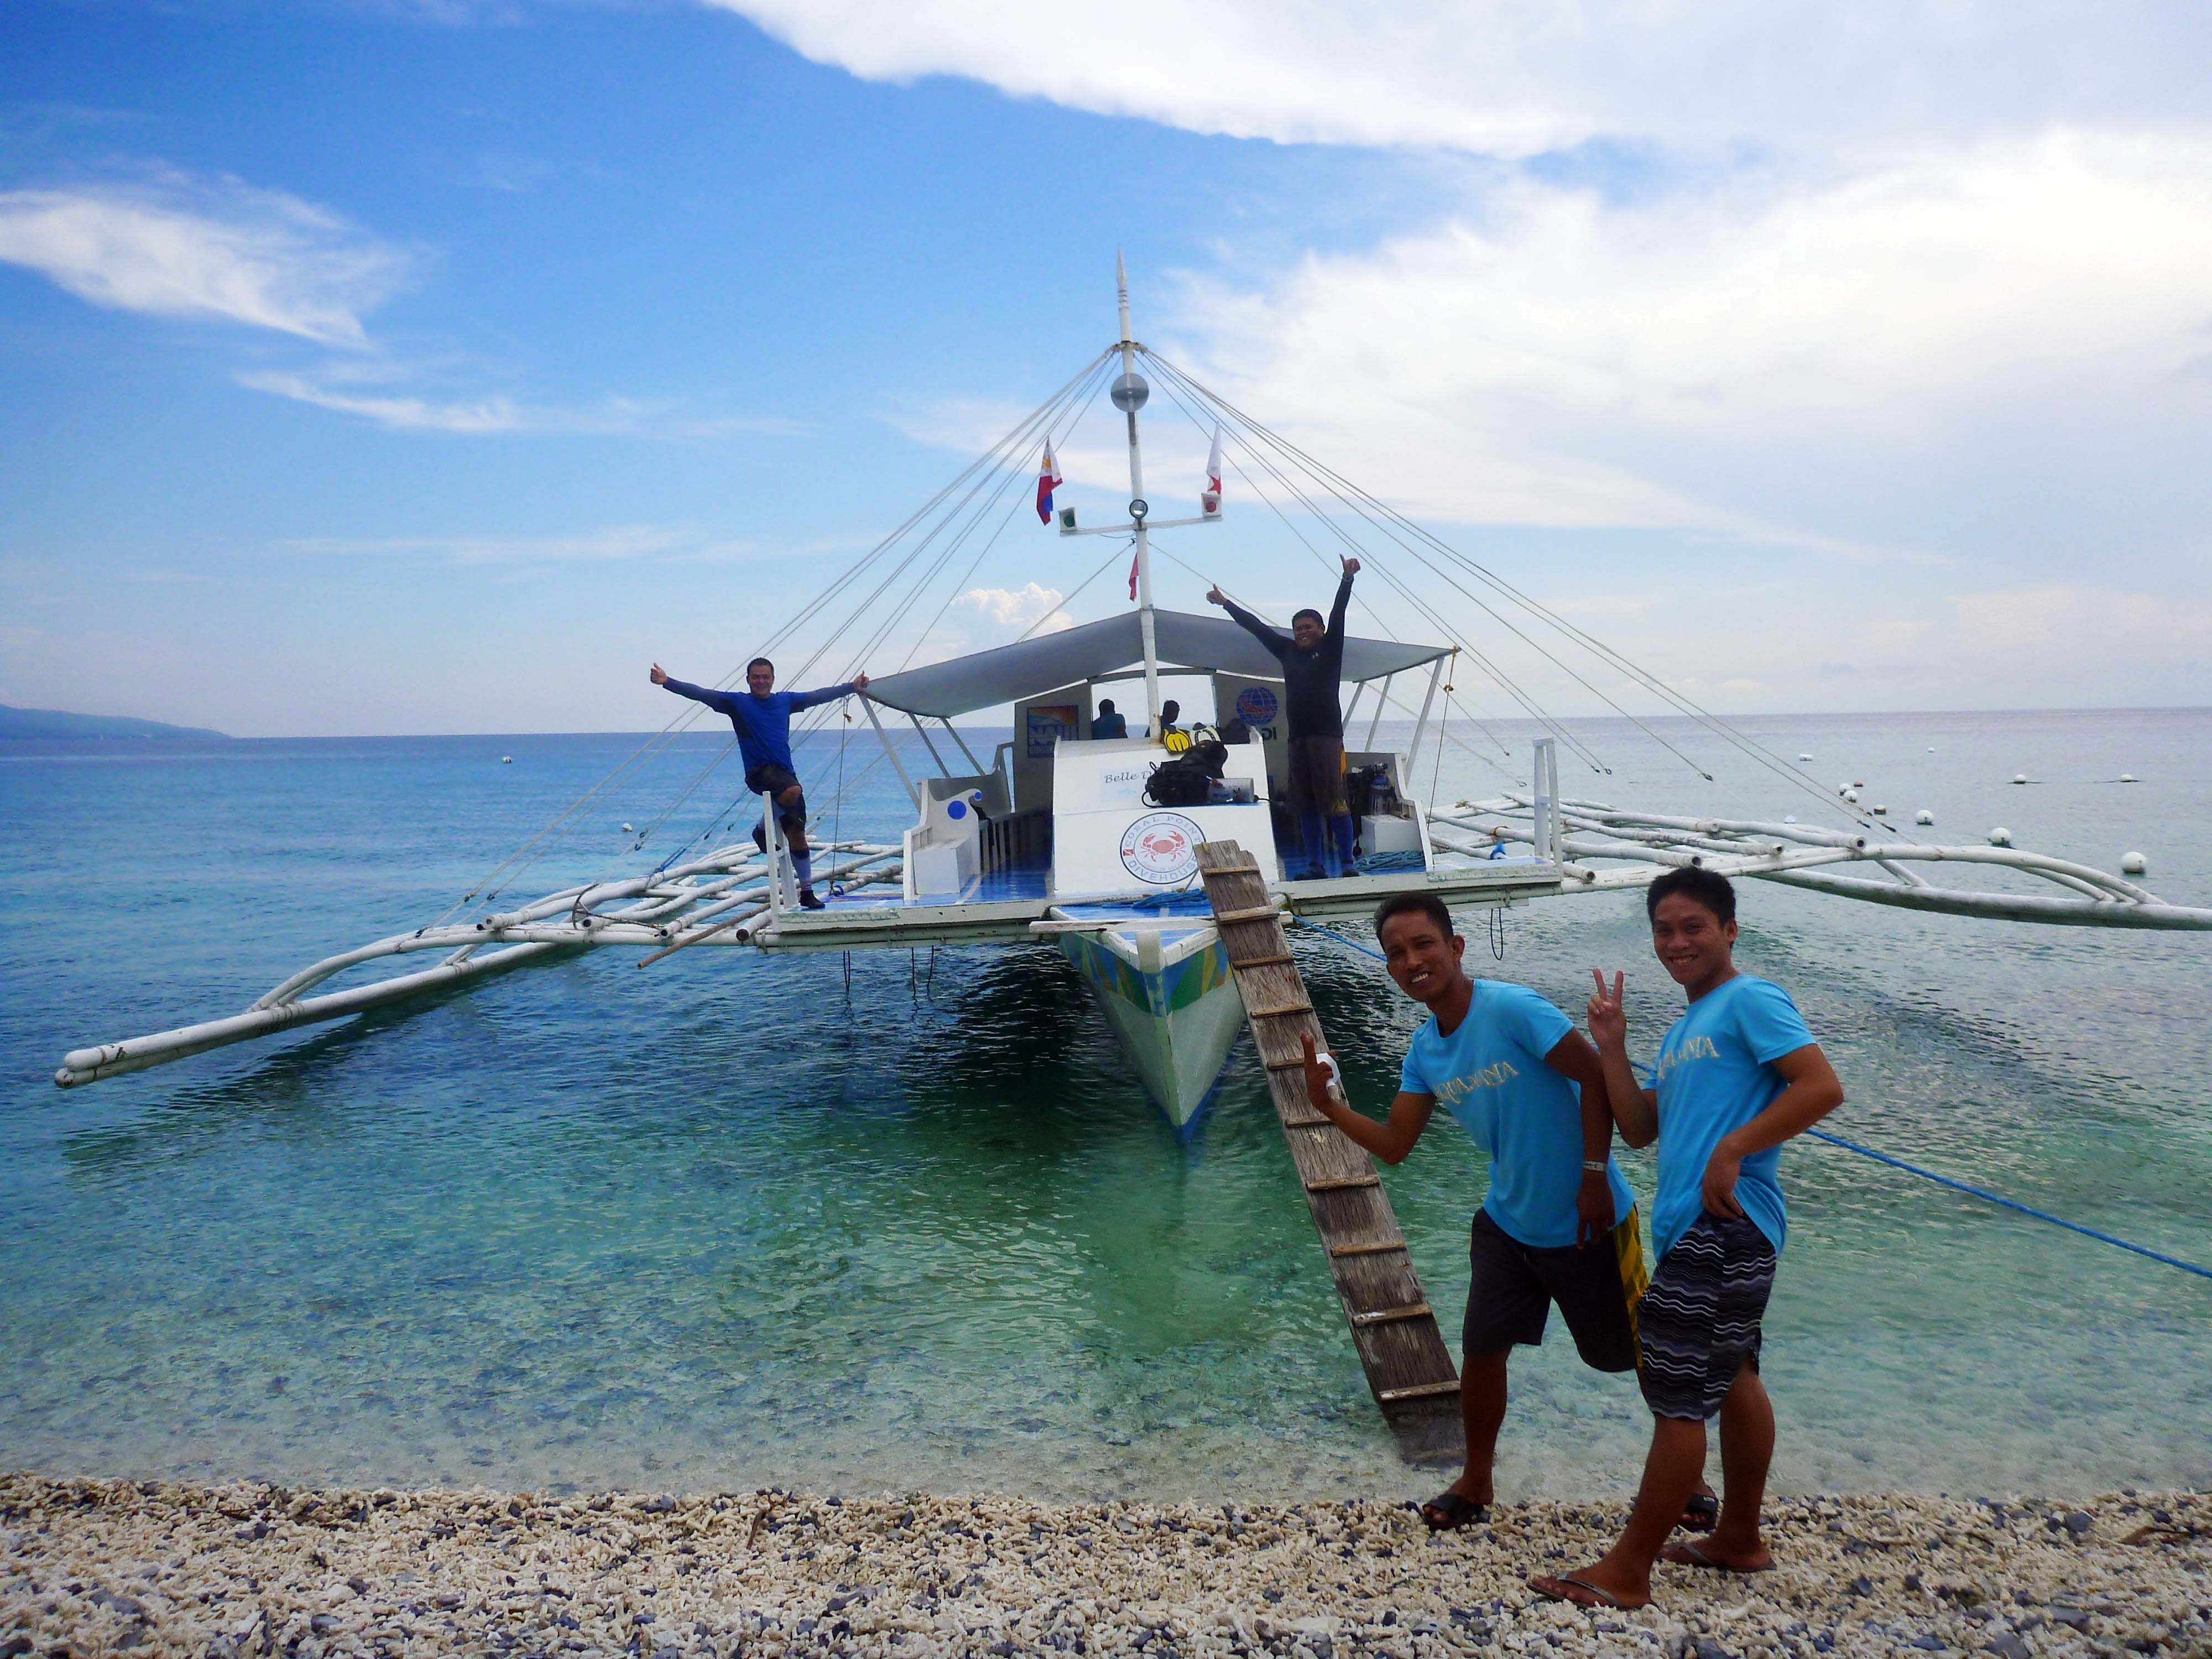 BLUEWATER 有專業的潛水中心和自己的螃蟹船 (Photographer/ Ran)